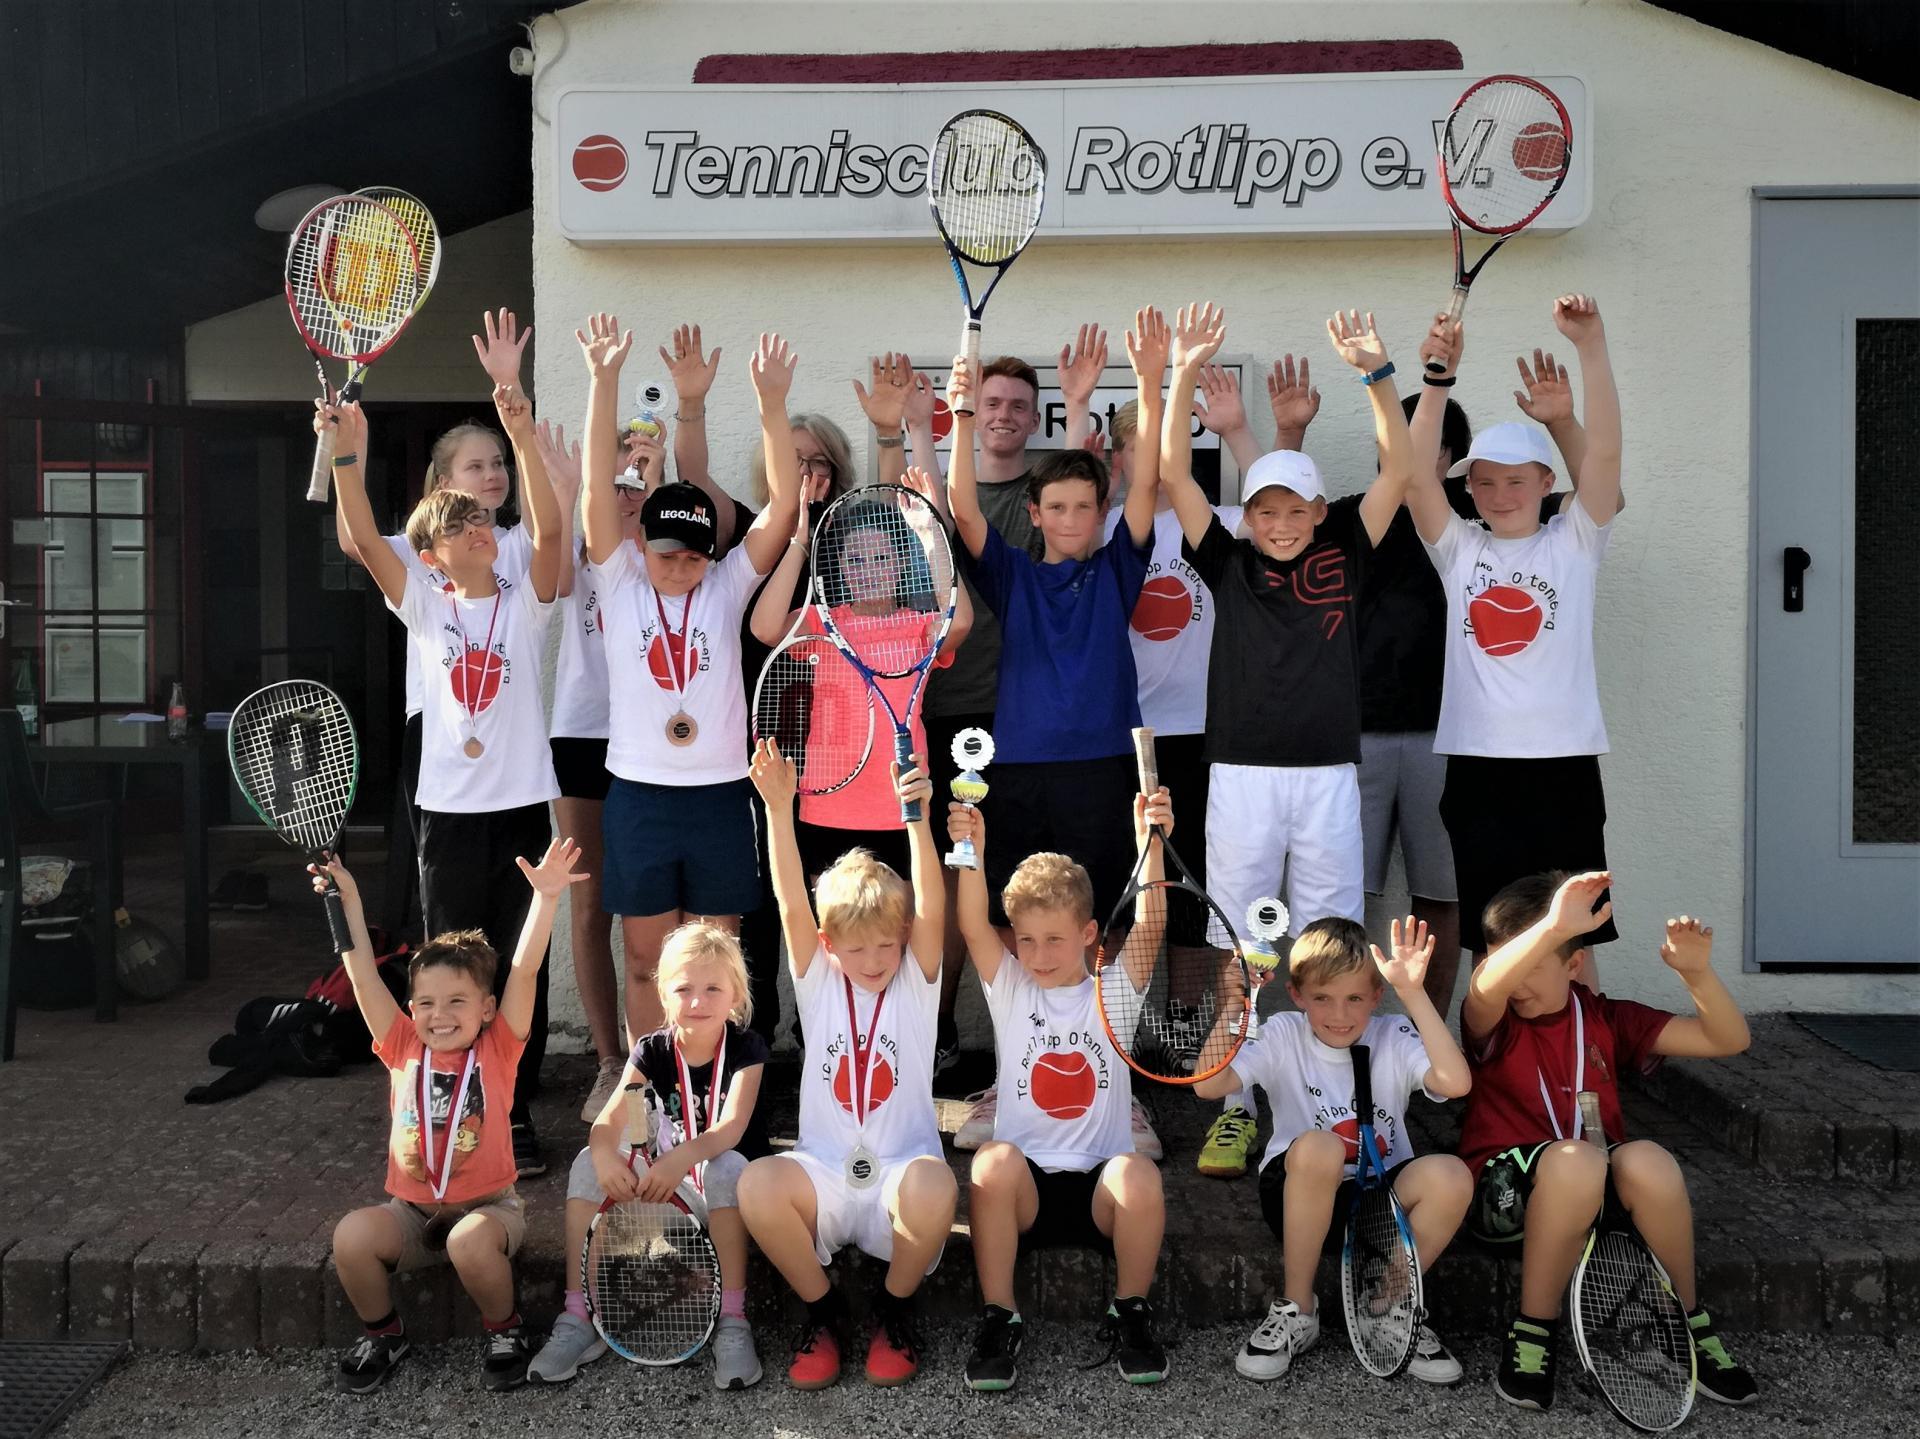 Kids-Meisterschaften beim TC Rotlipp